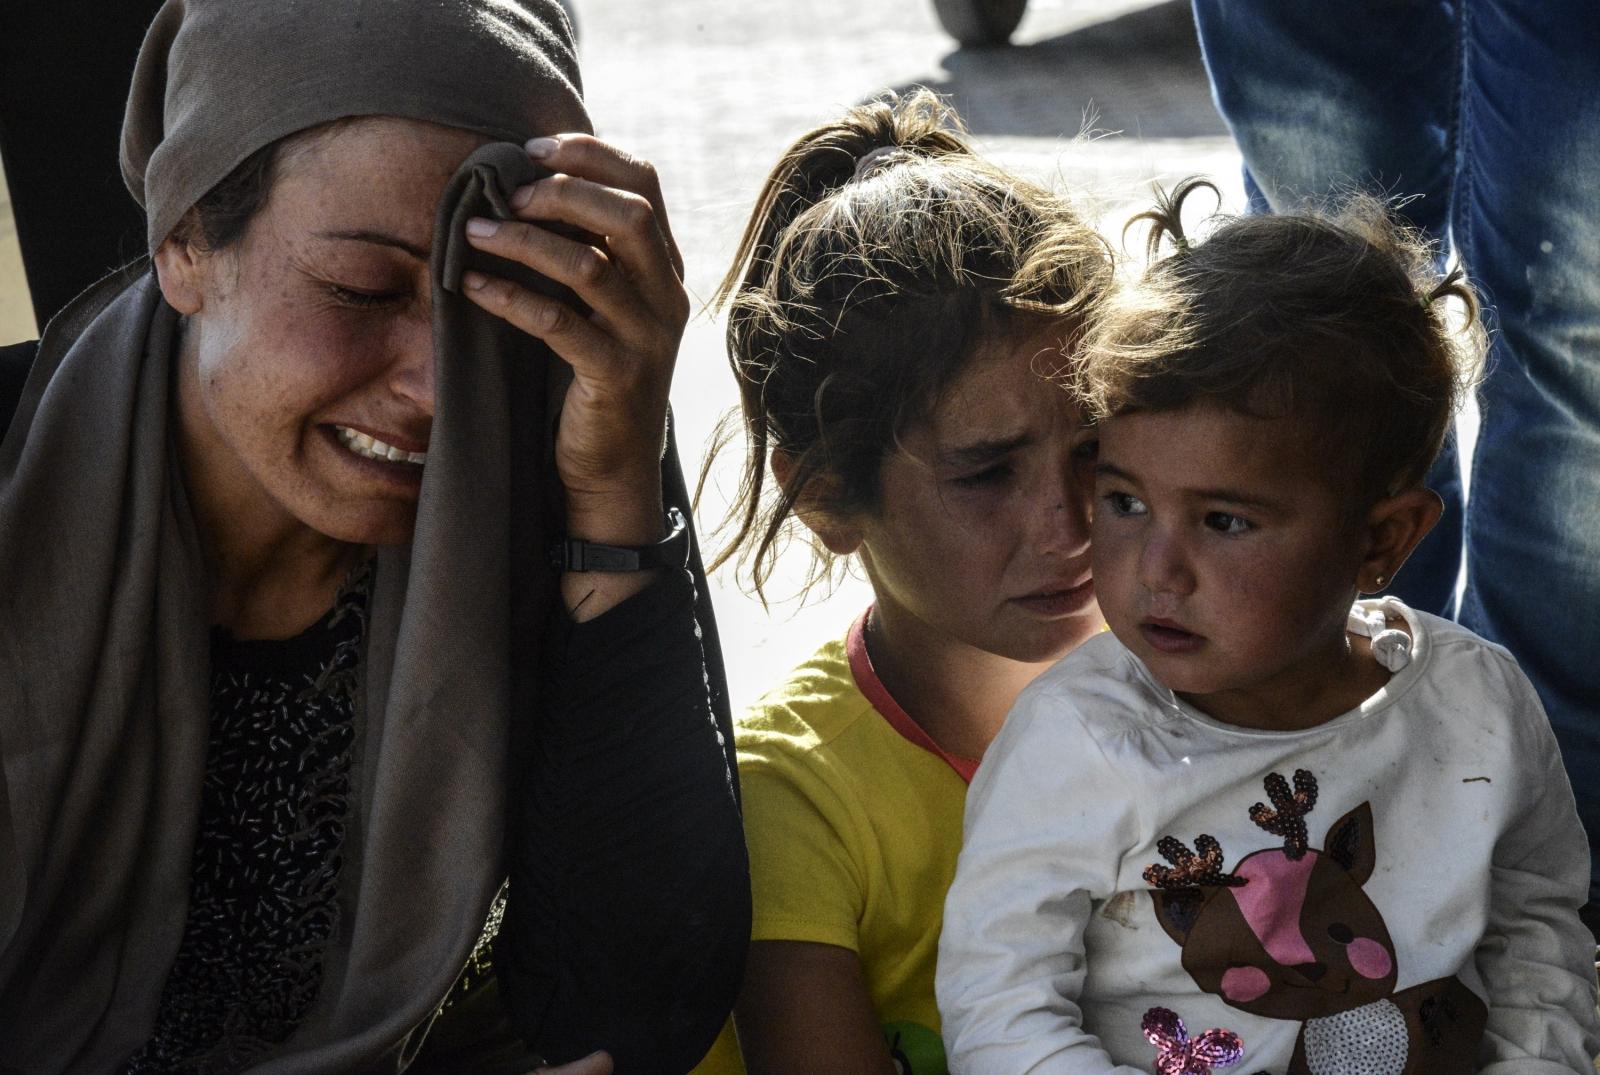 Relatives wait for news of those injuredin